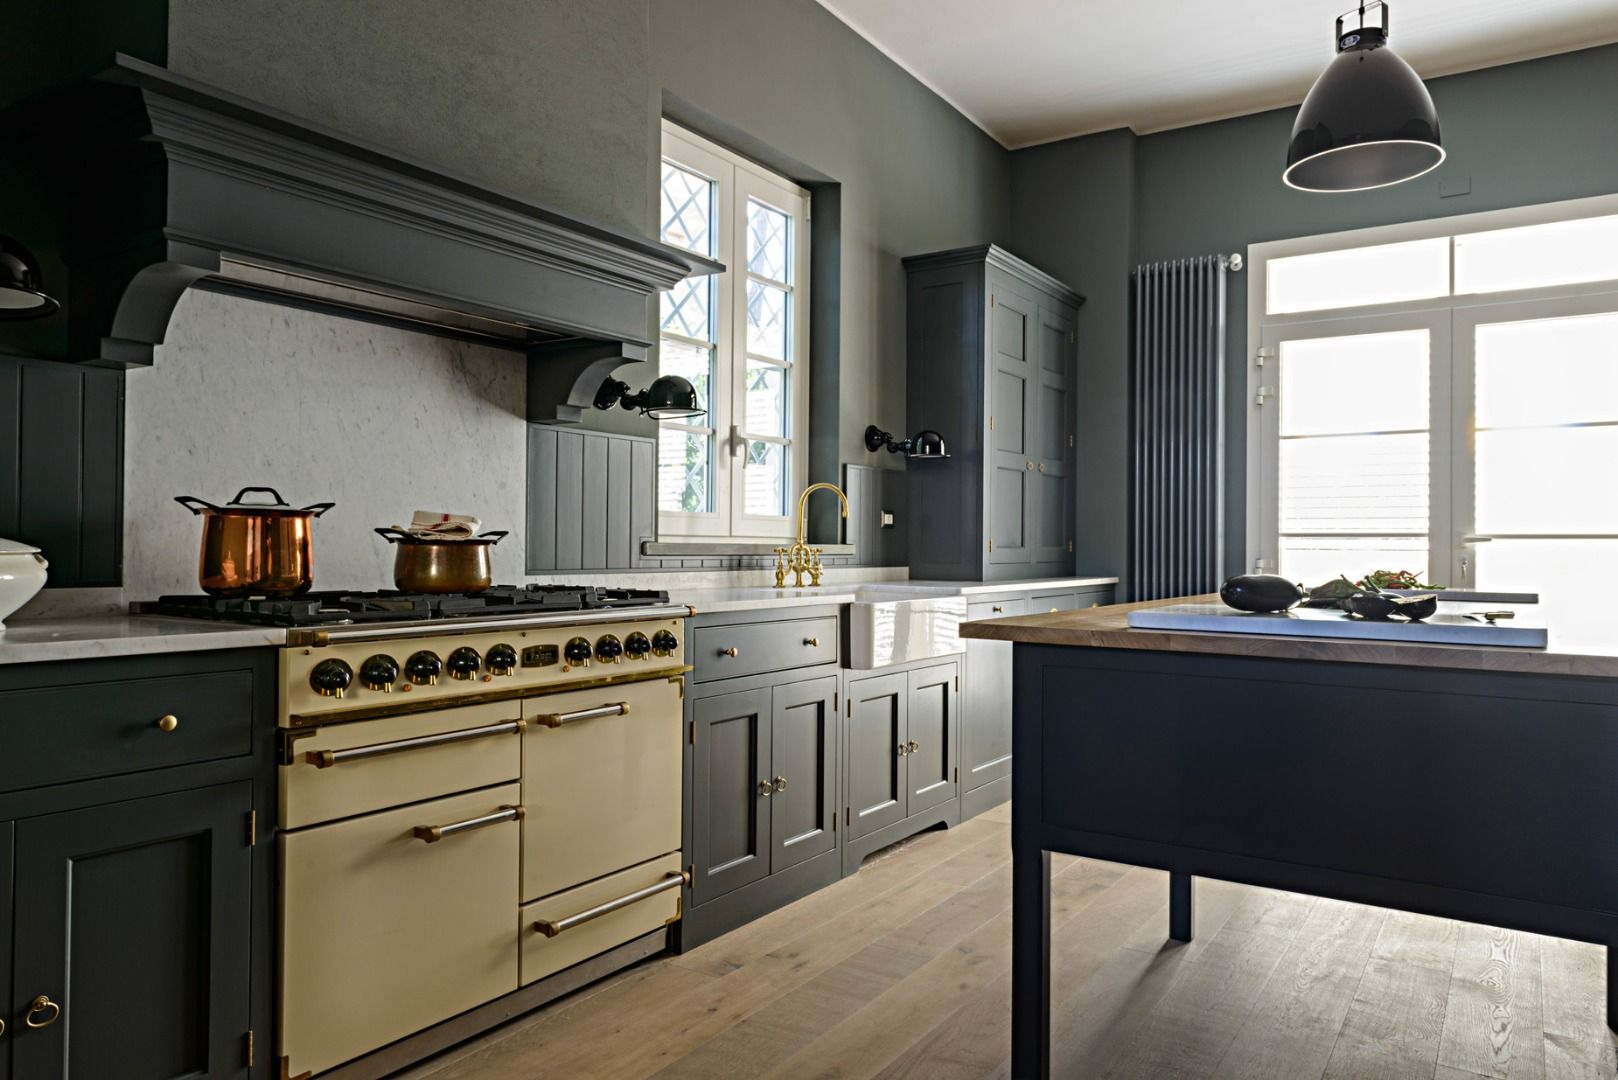 cucine stile inglese - Cerca con Google   Cucine   Pinterest   Google